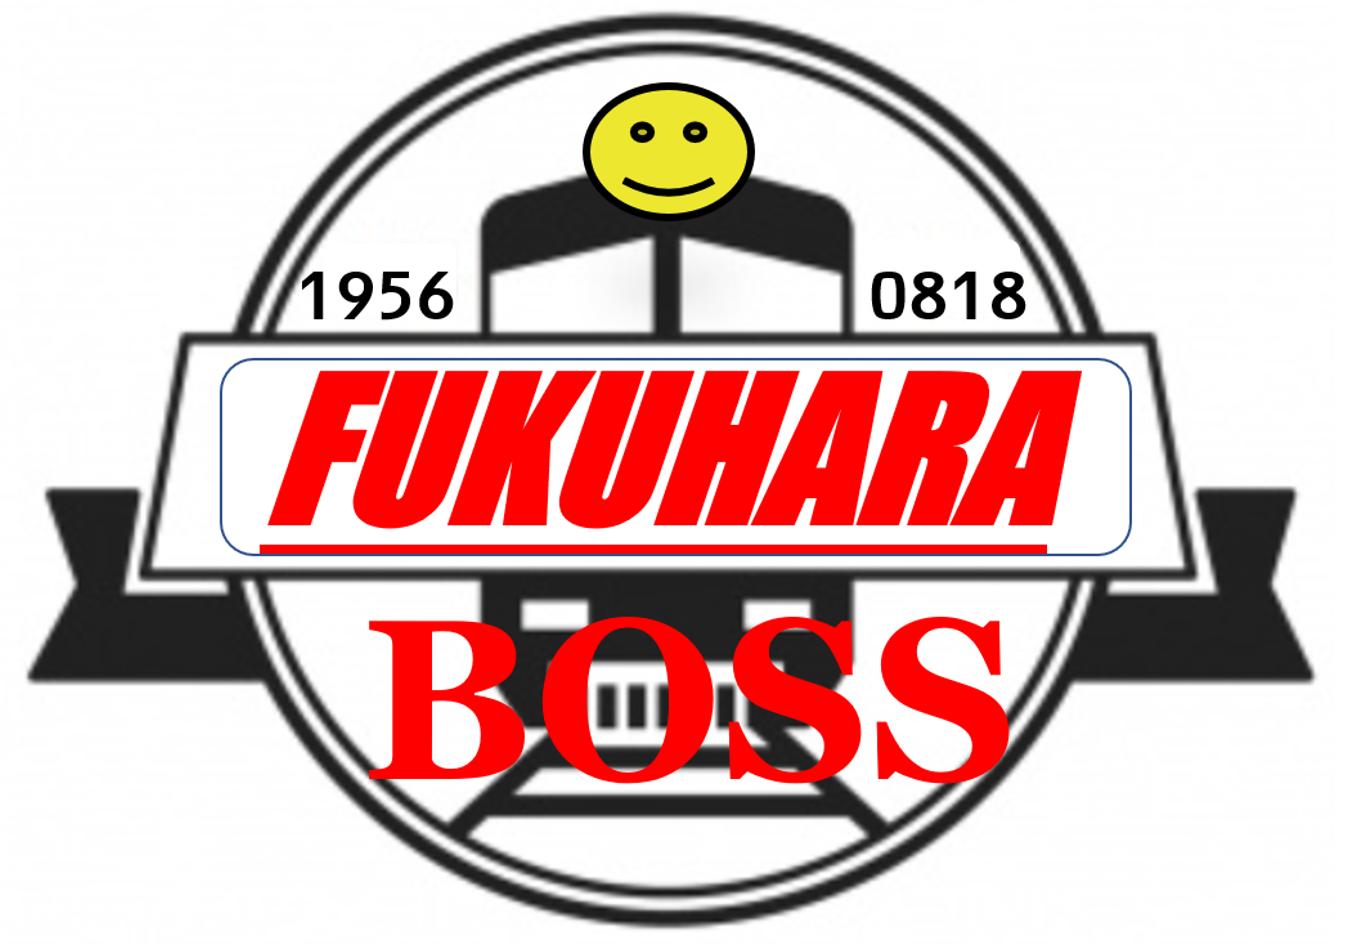 BOSS-Fukuhara